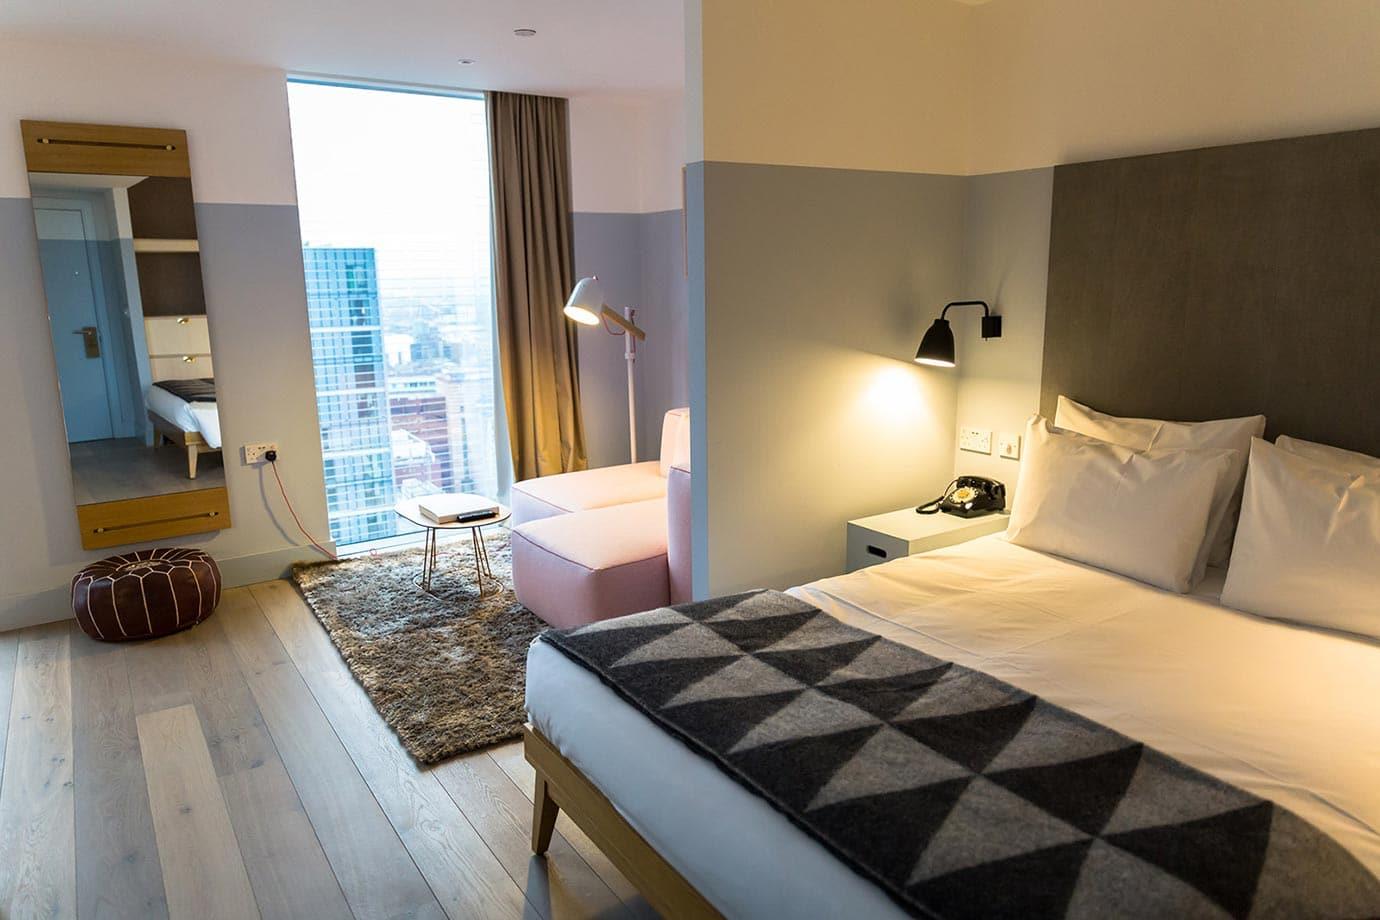 Leman locke review london an adventurous world for Trendy boutique hotels